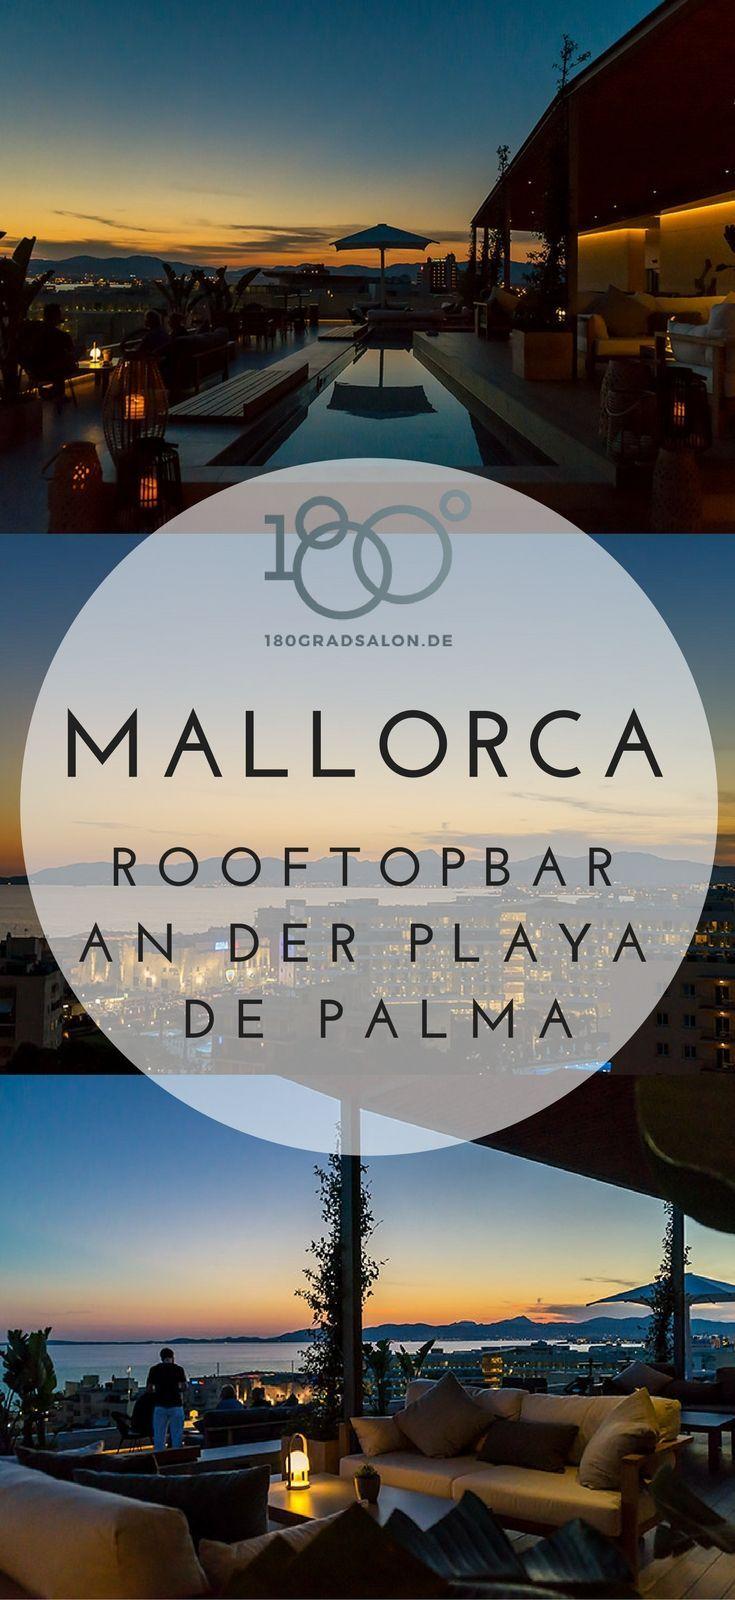 Katagi Blau Mallorca Rooftop Bar Und Restaurant An Der Playa De